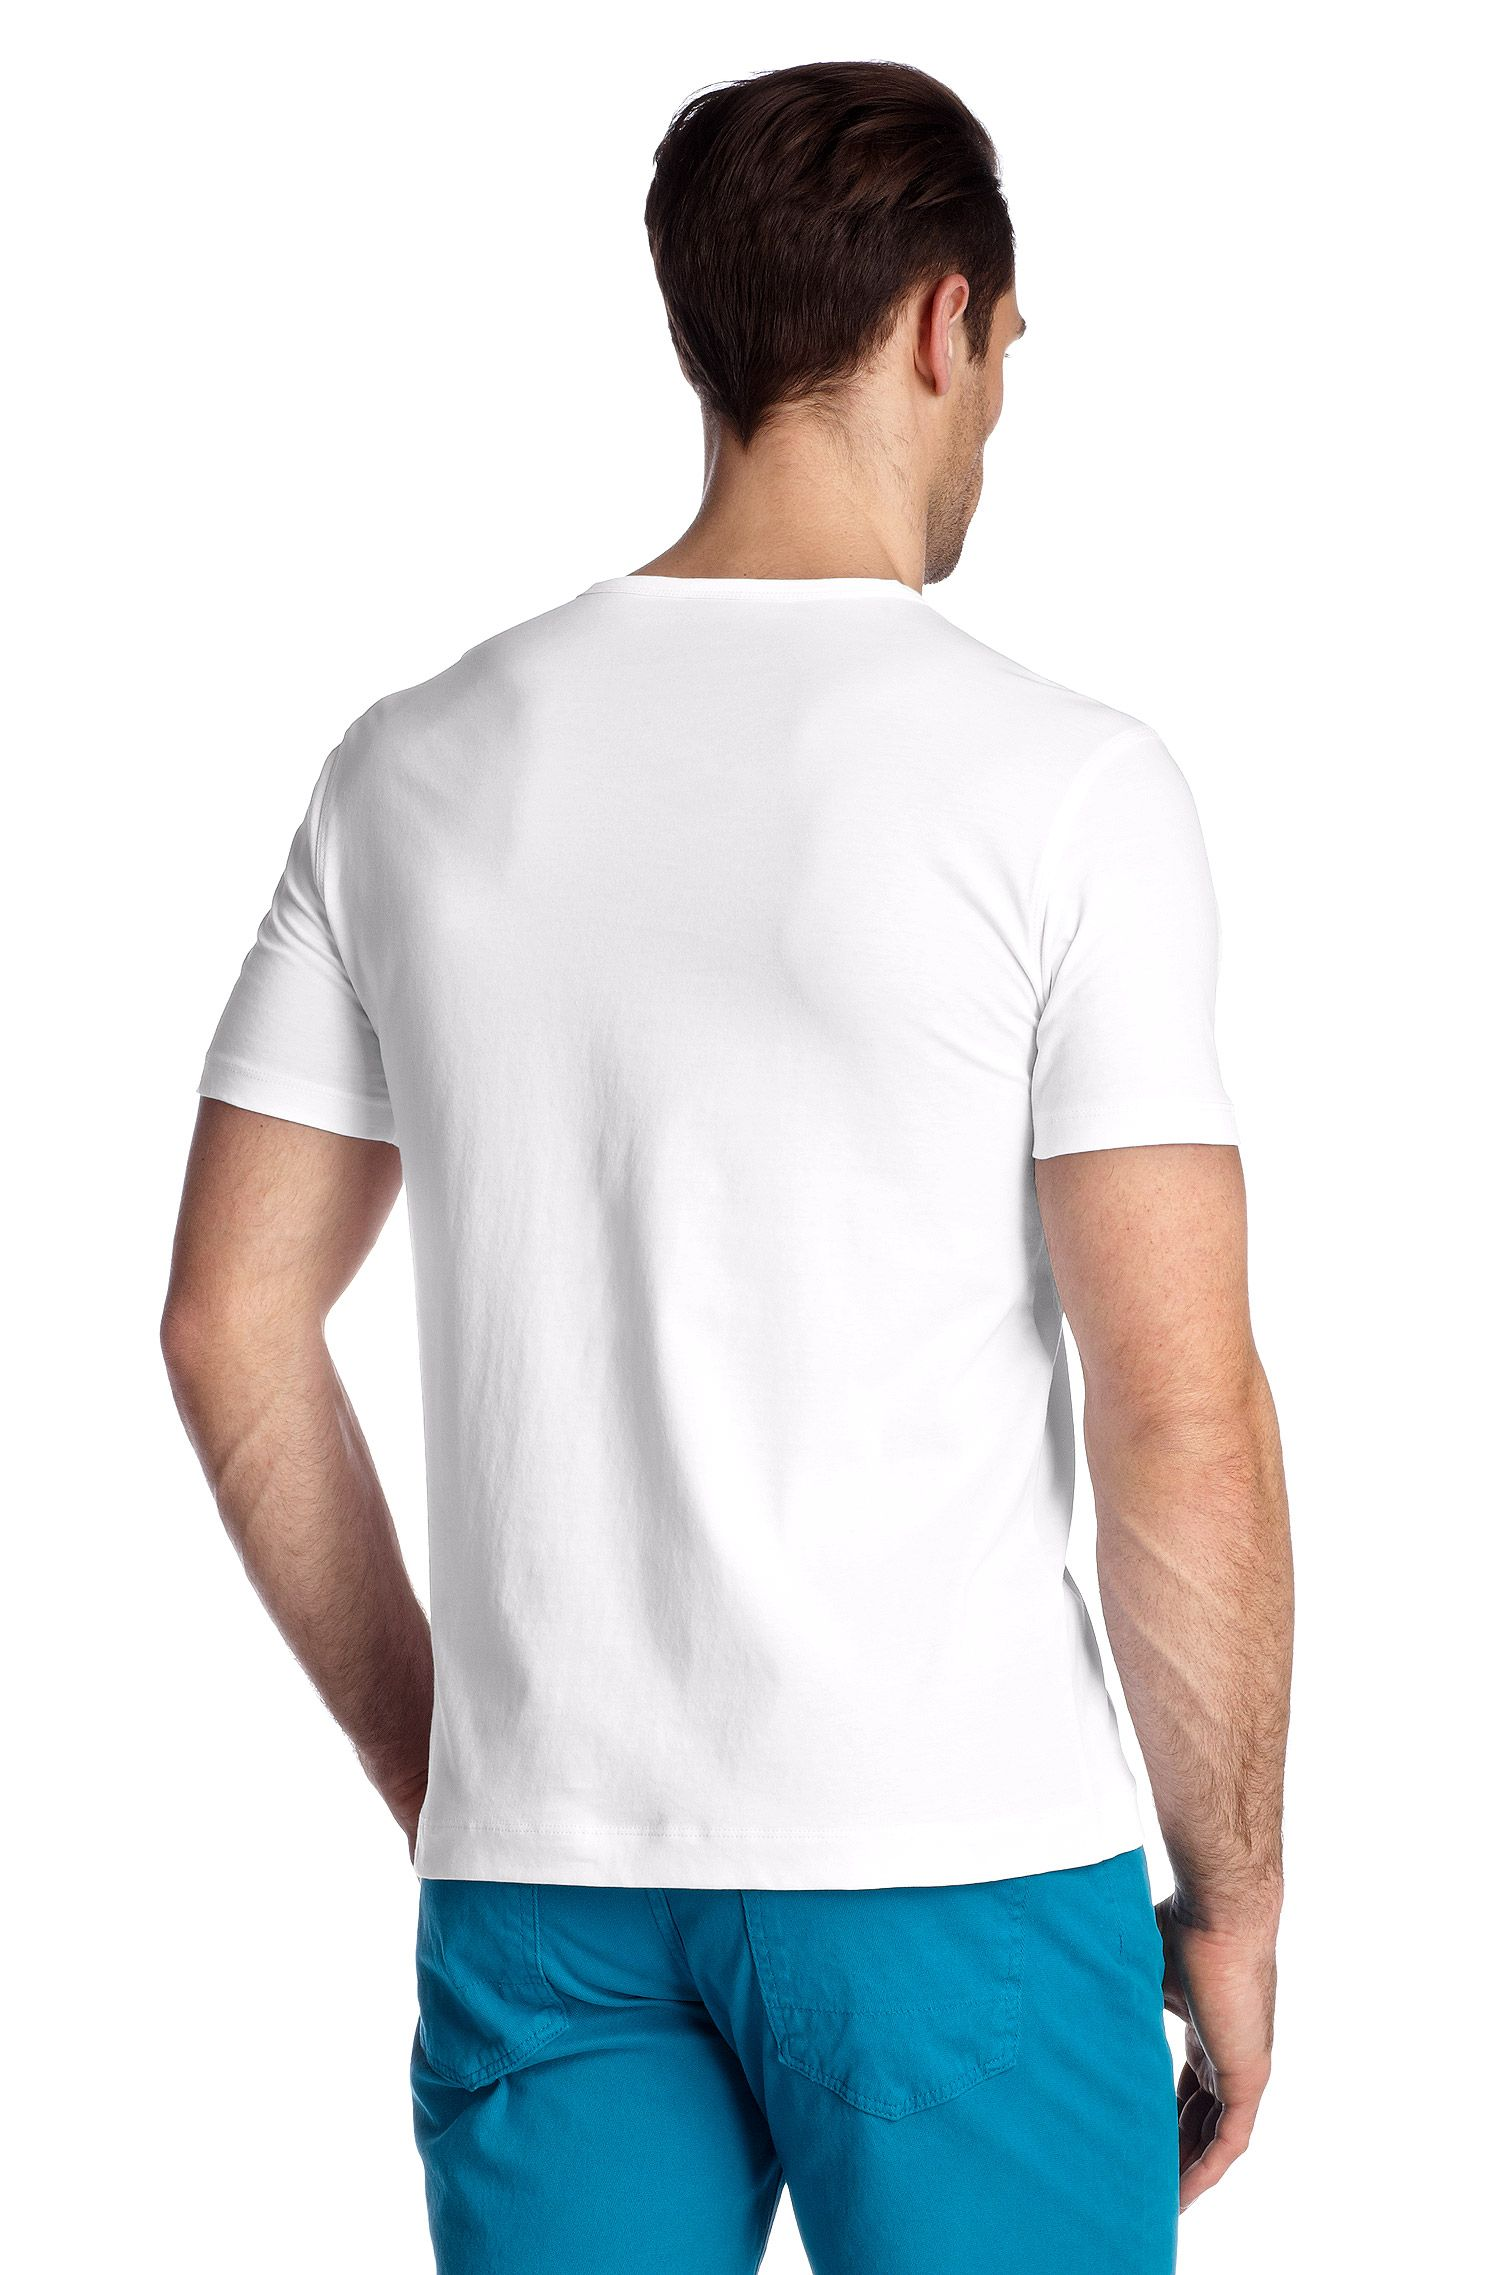 T-shirt ´Terni 93 modern Essential`